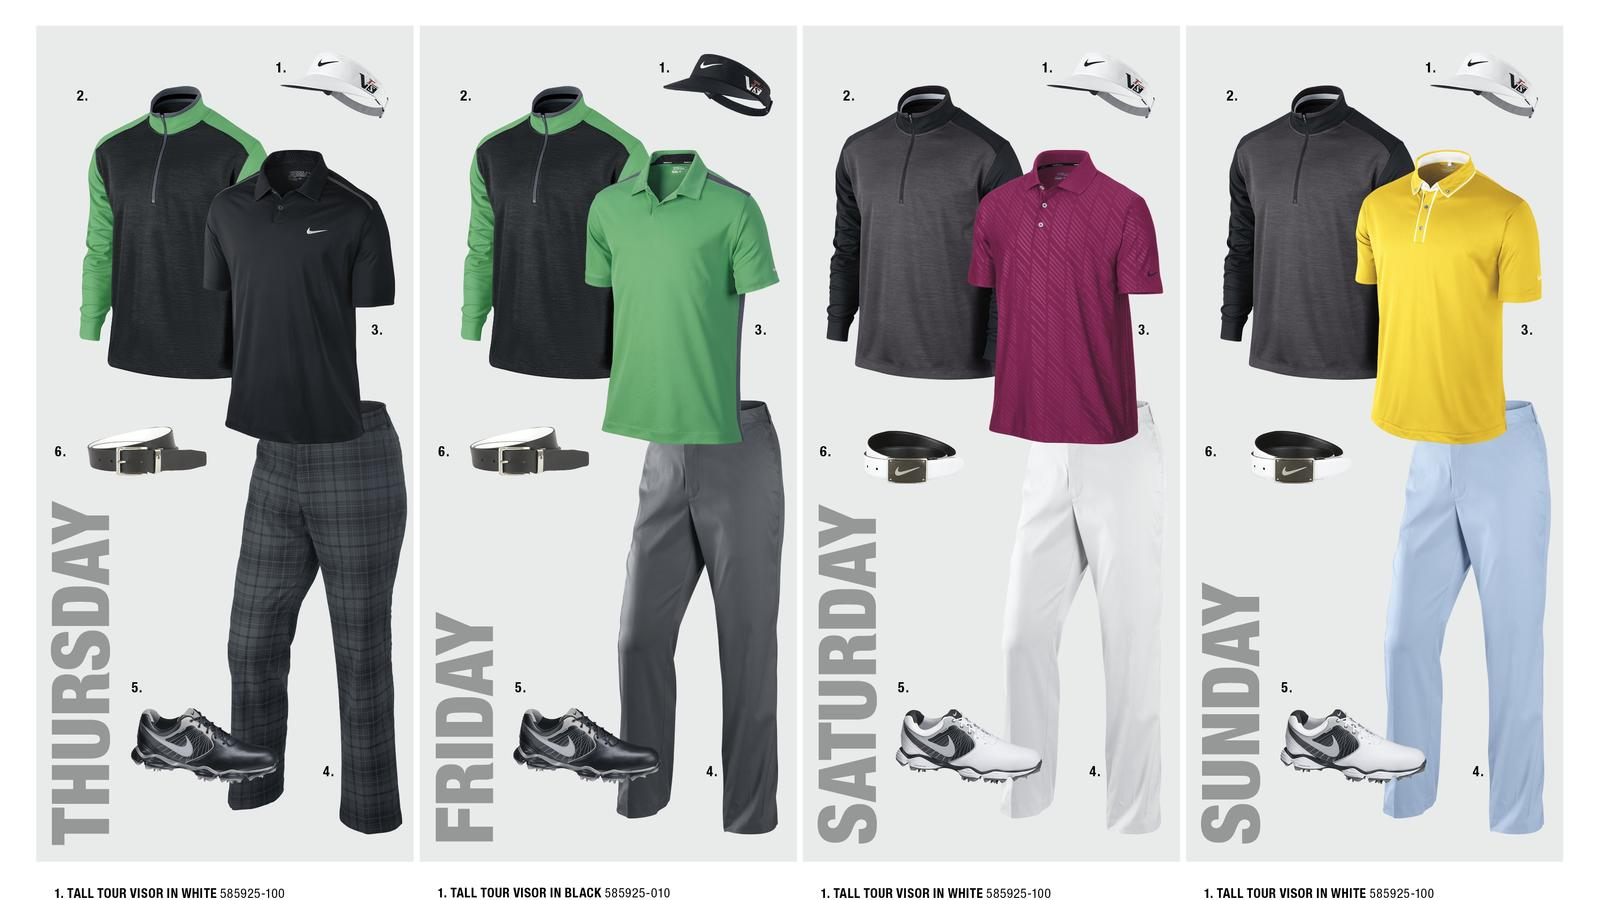 Carl Pettersson's Open Championship Looks